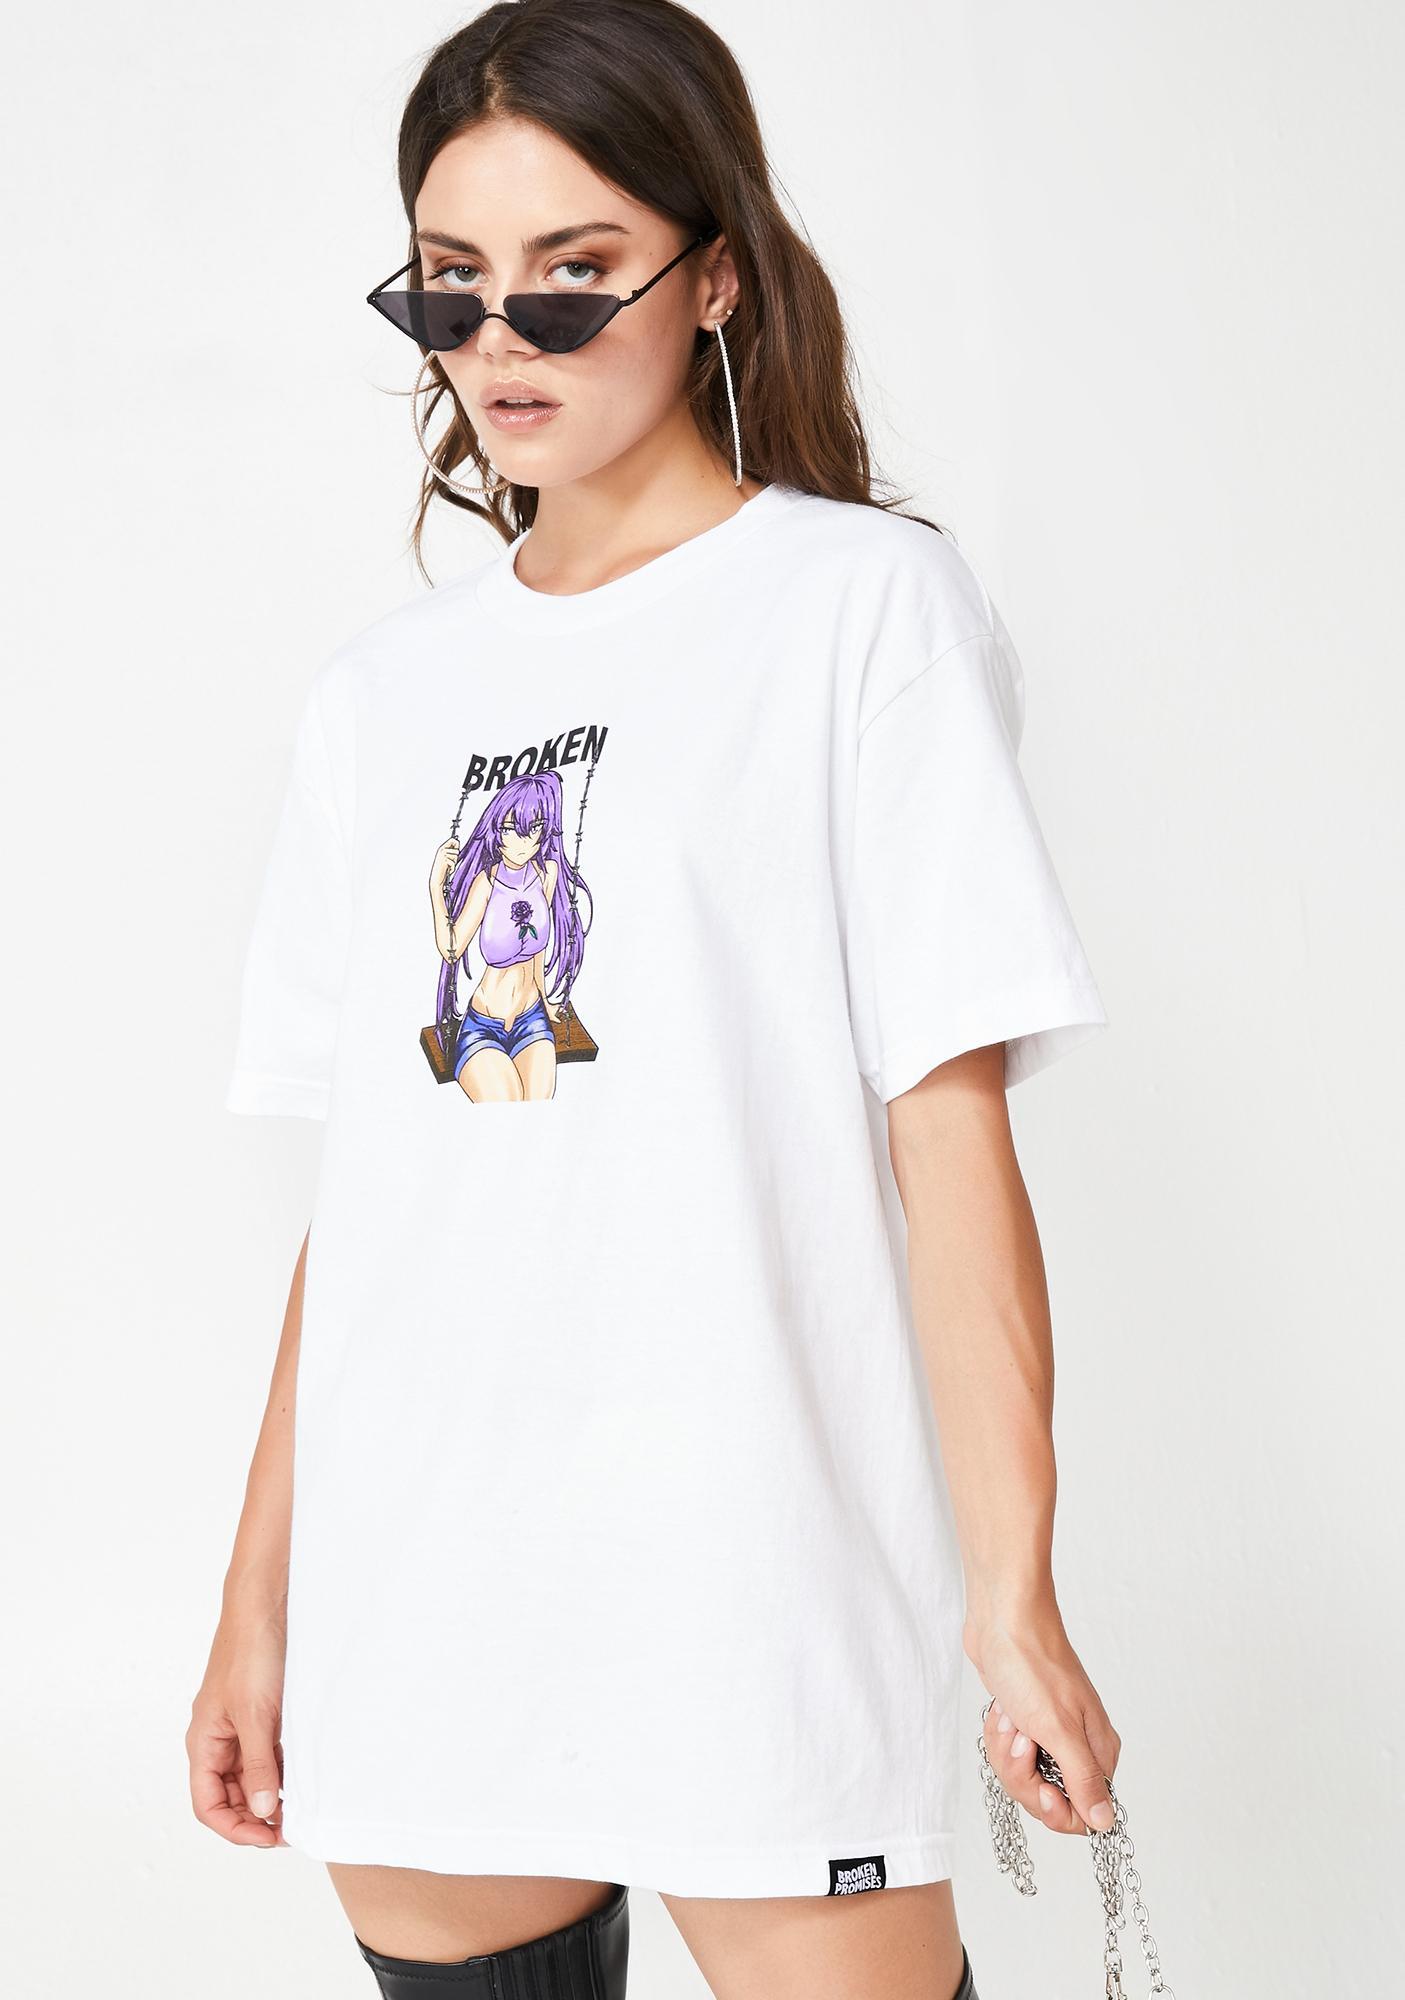 BROKEN PROMISES CO Broken Anime Girl Graphic Tee